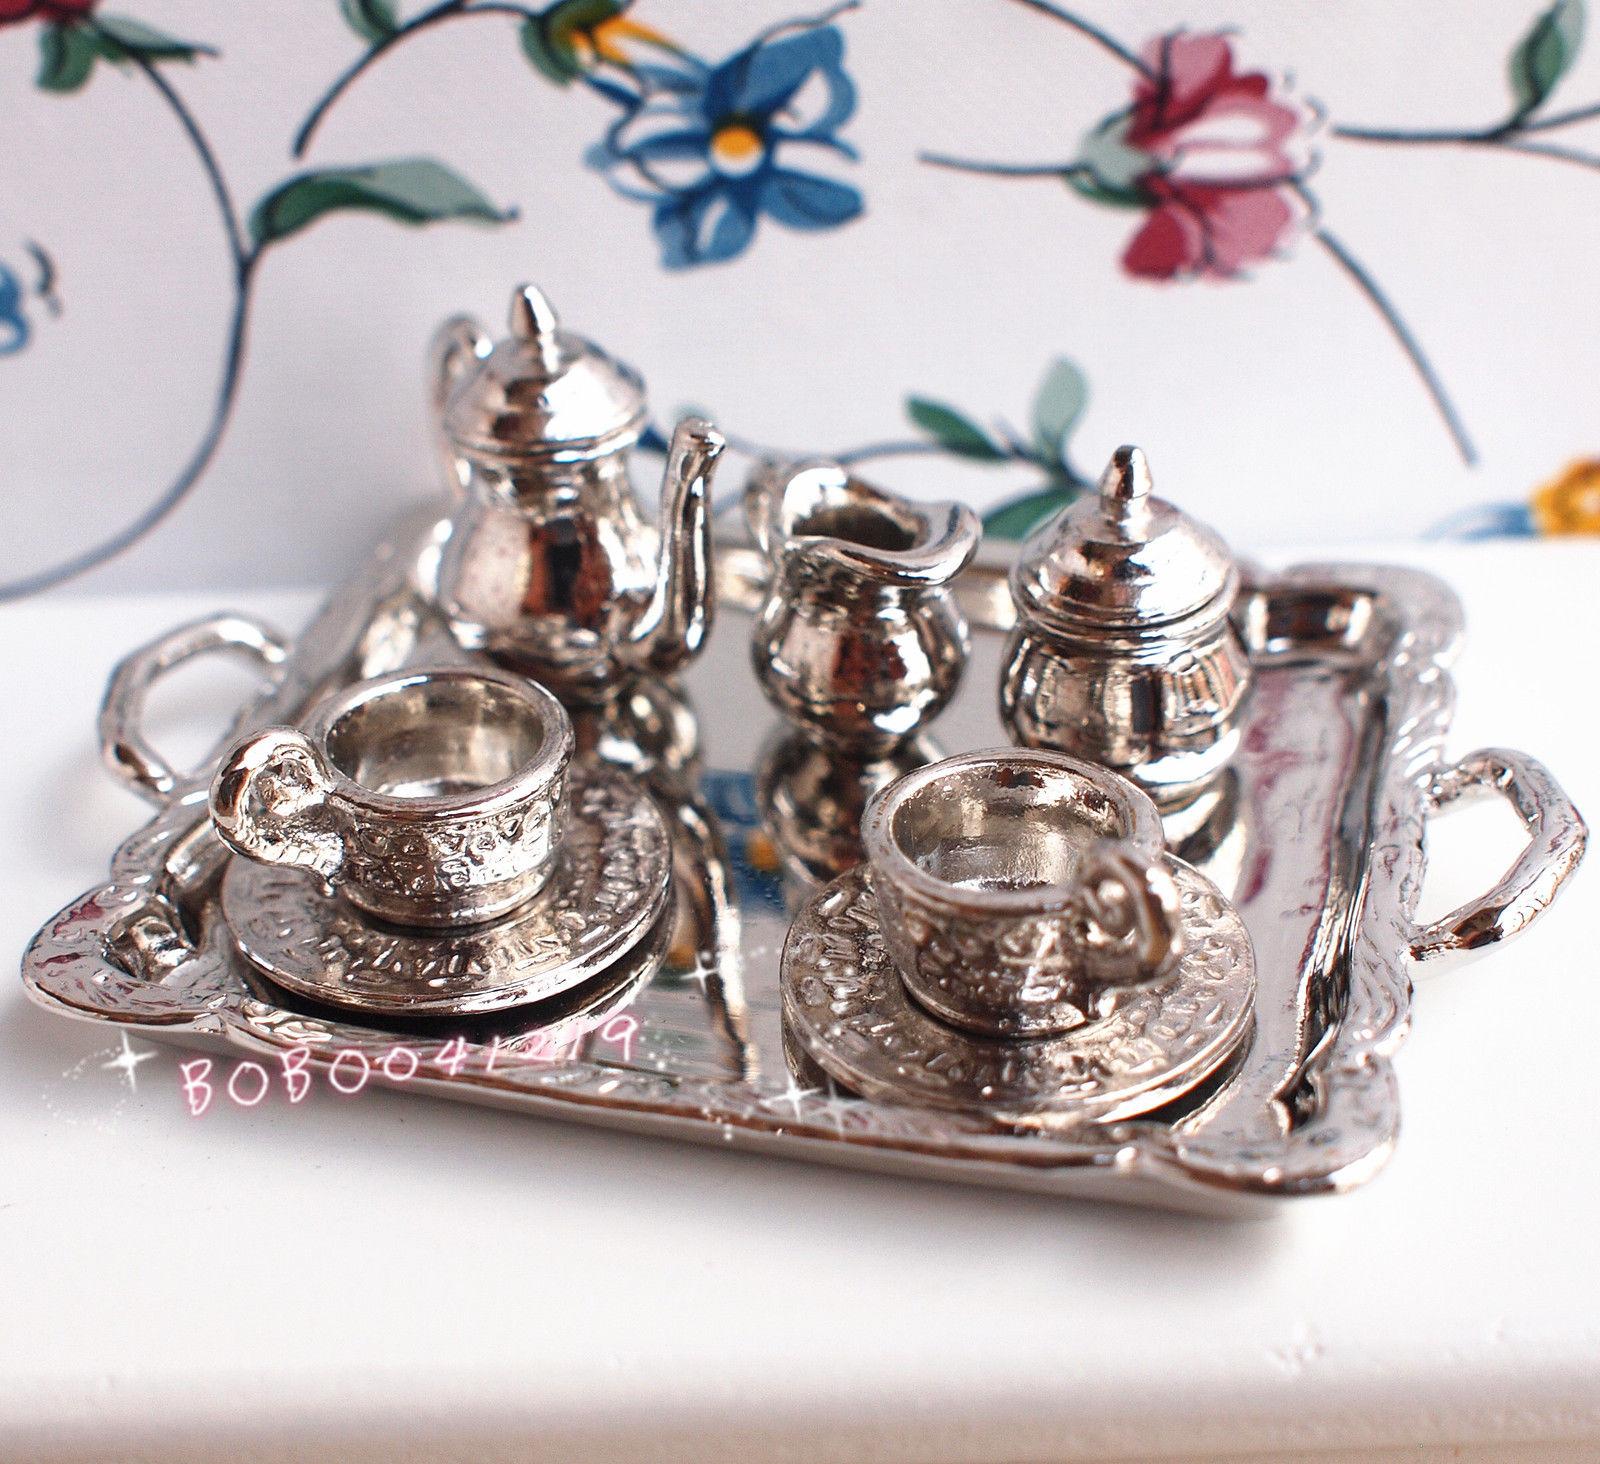 Medium Of Silver Tea Set